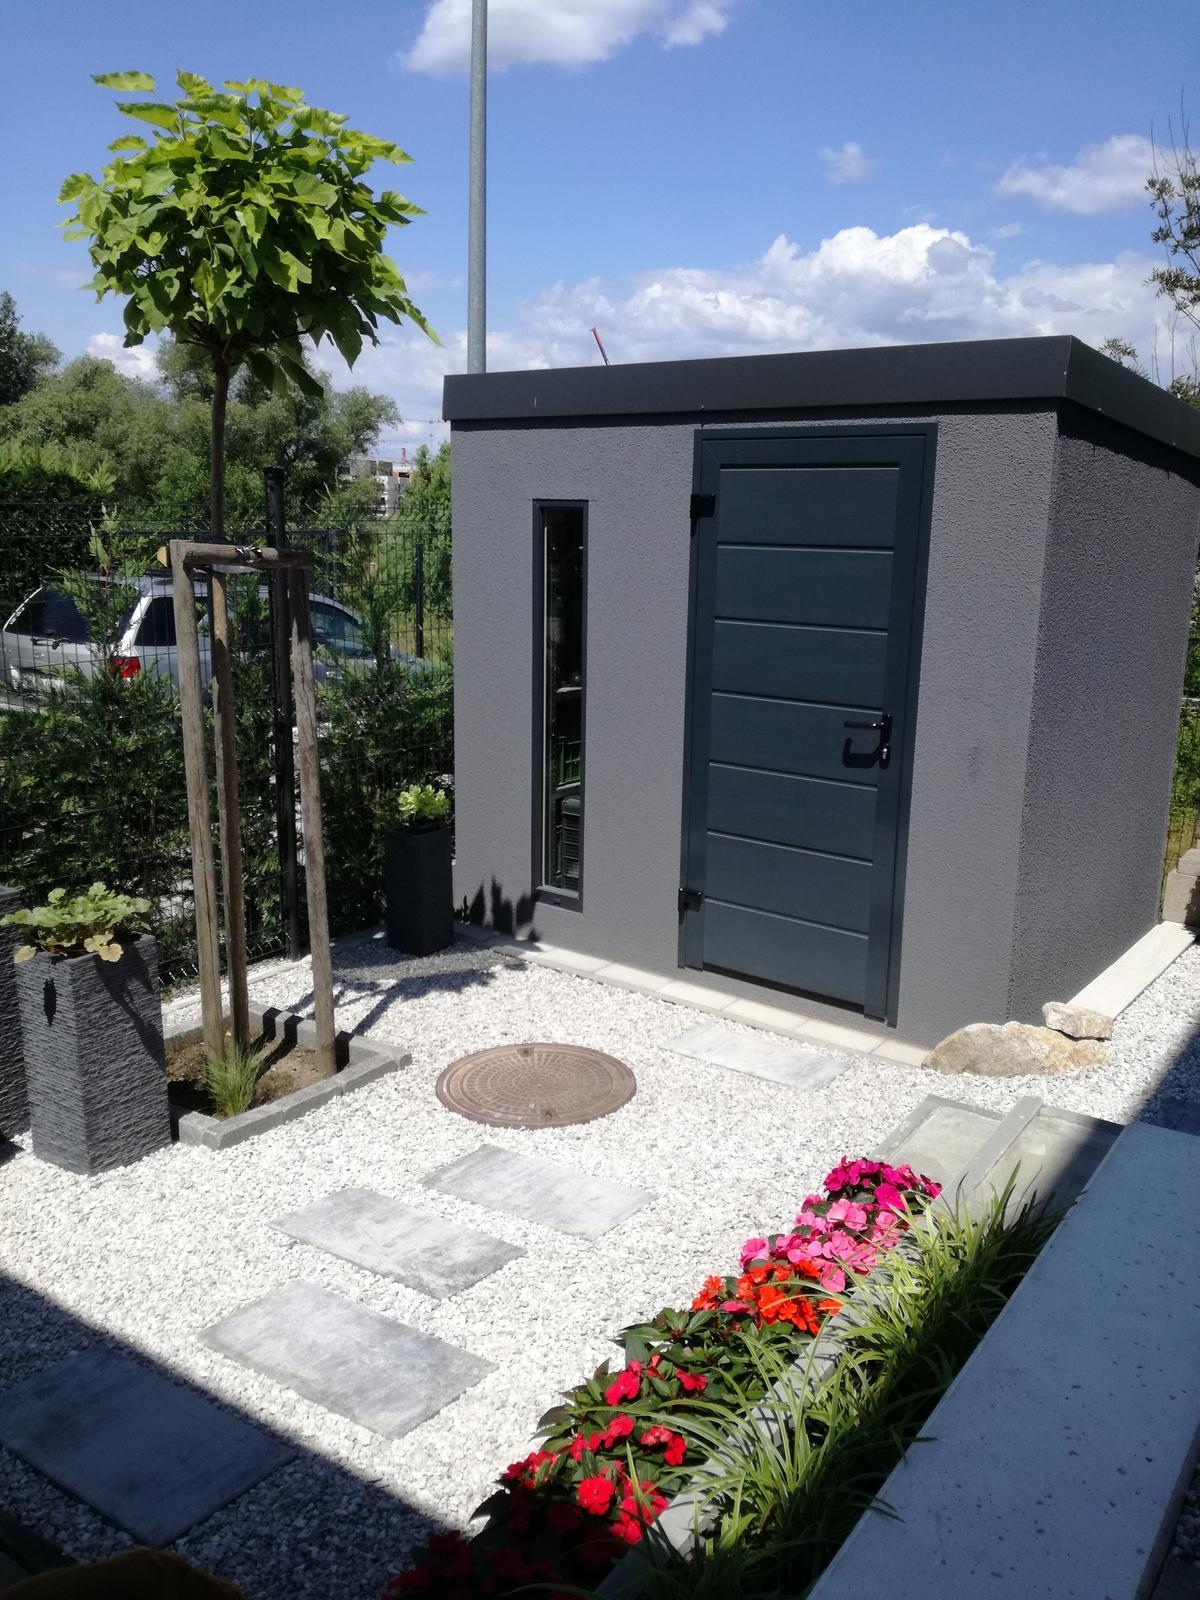 zahradny domcek Gardeon - Obrázok č. 1